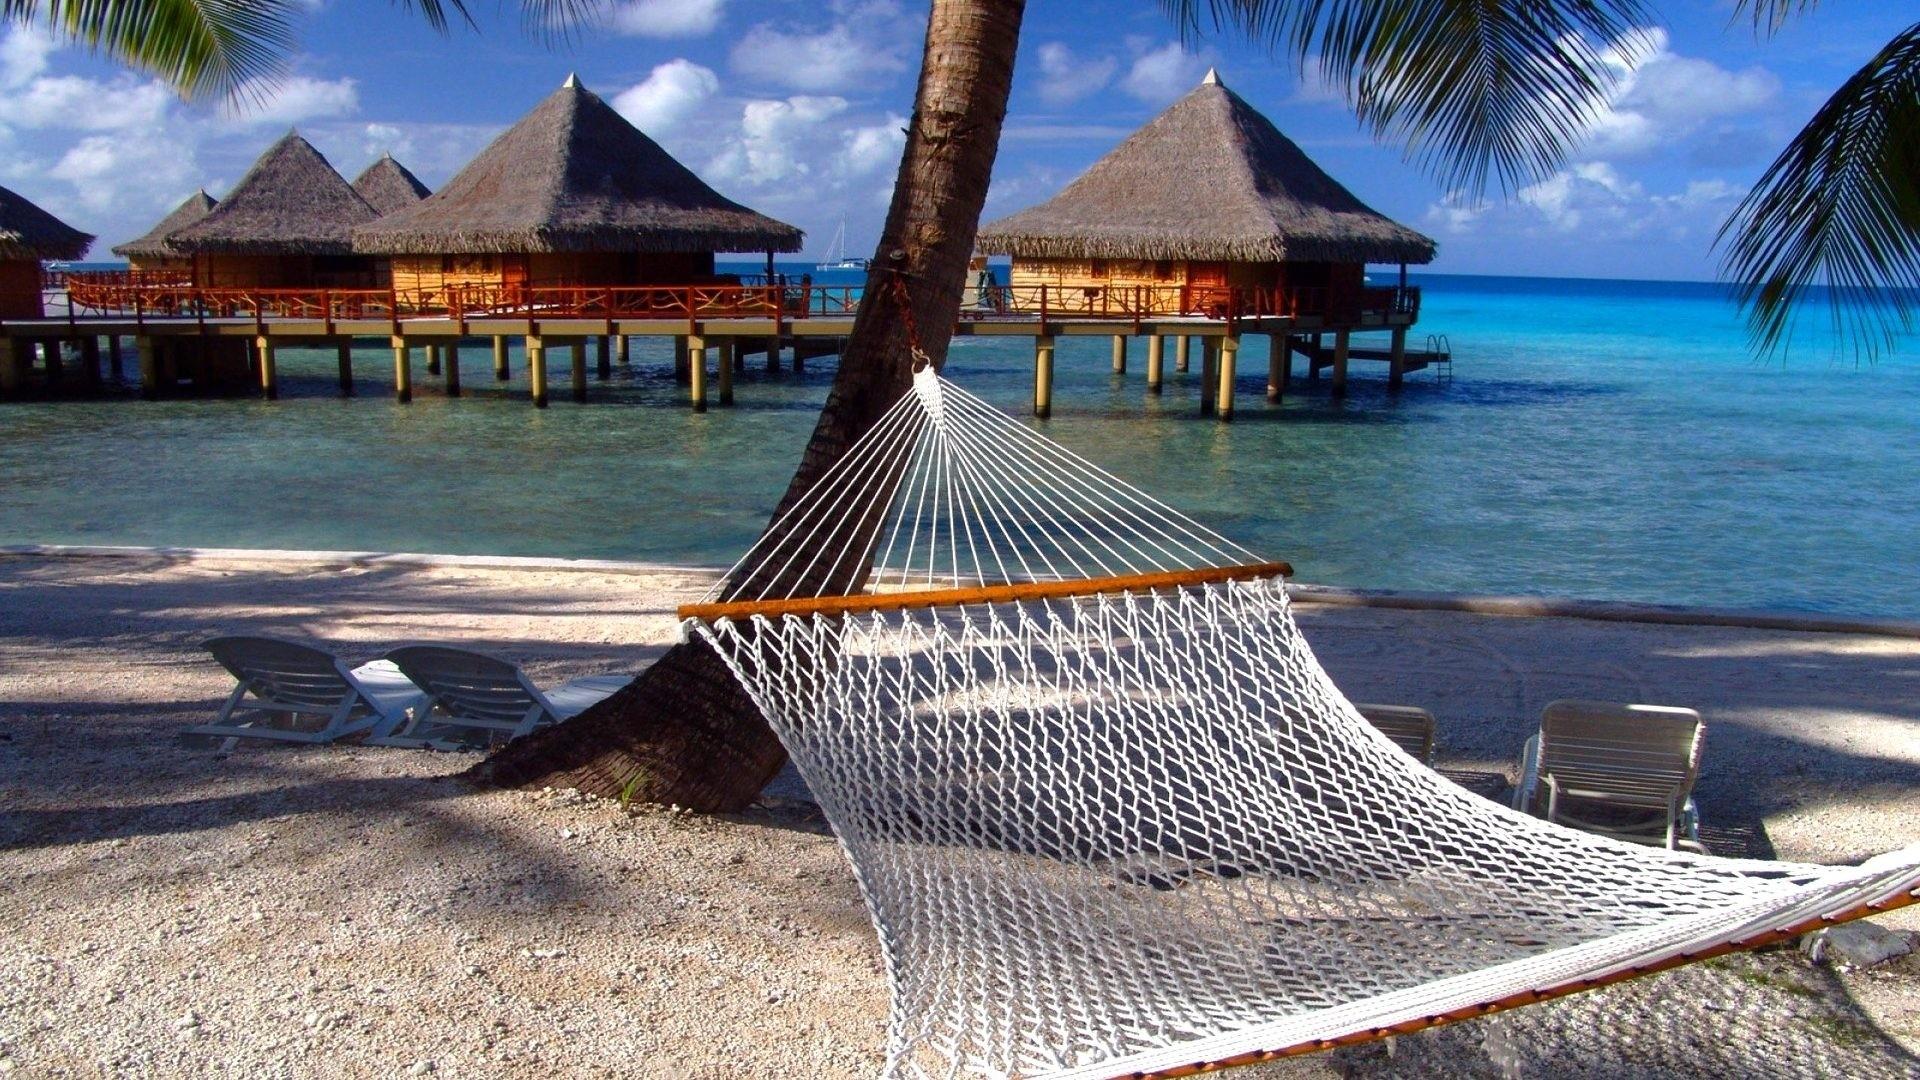 Res: 1920x1080, ocean scene summer houses hammock beach wallpaper hd download